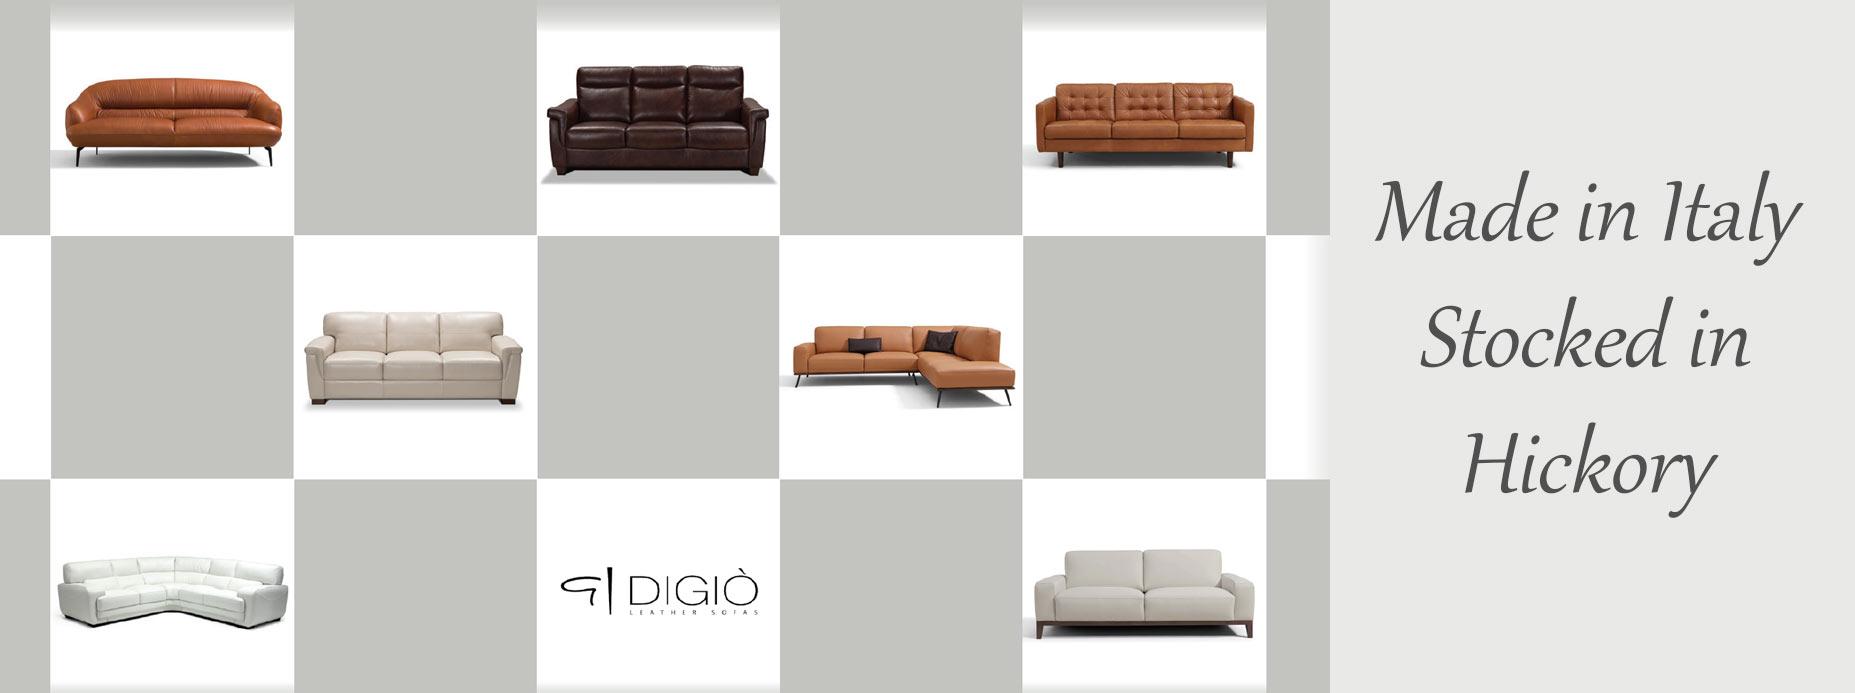 Digio Leather Sofas